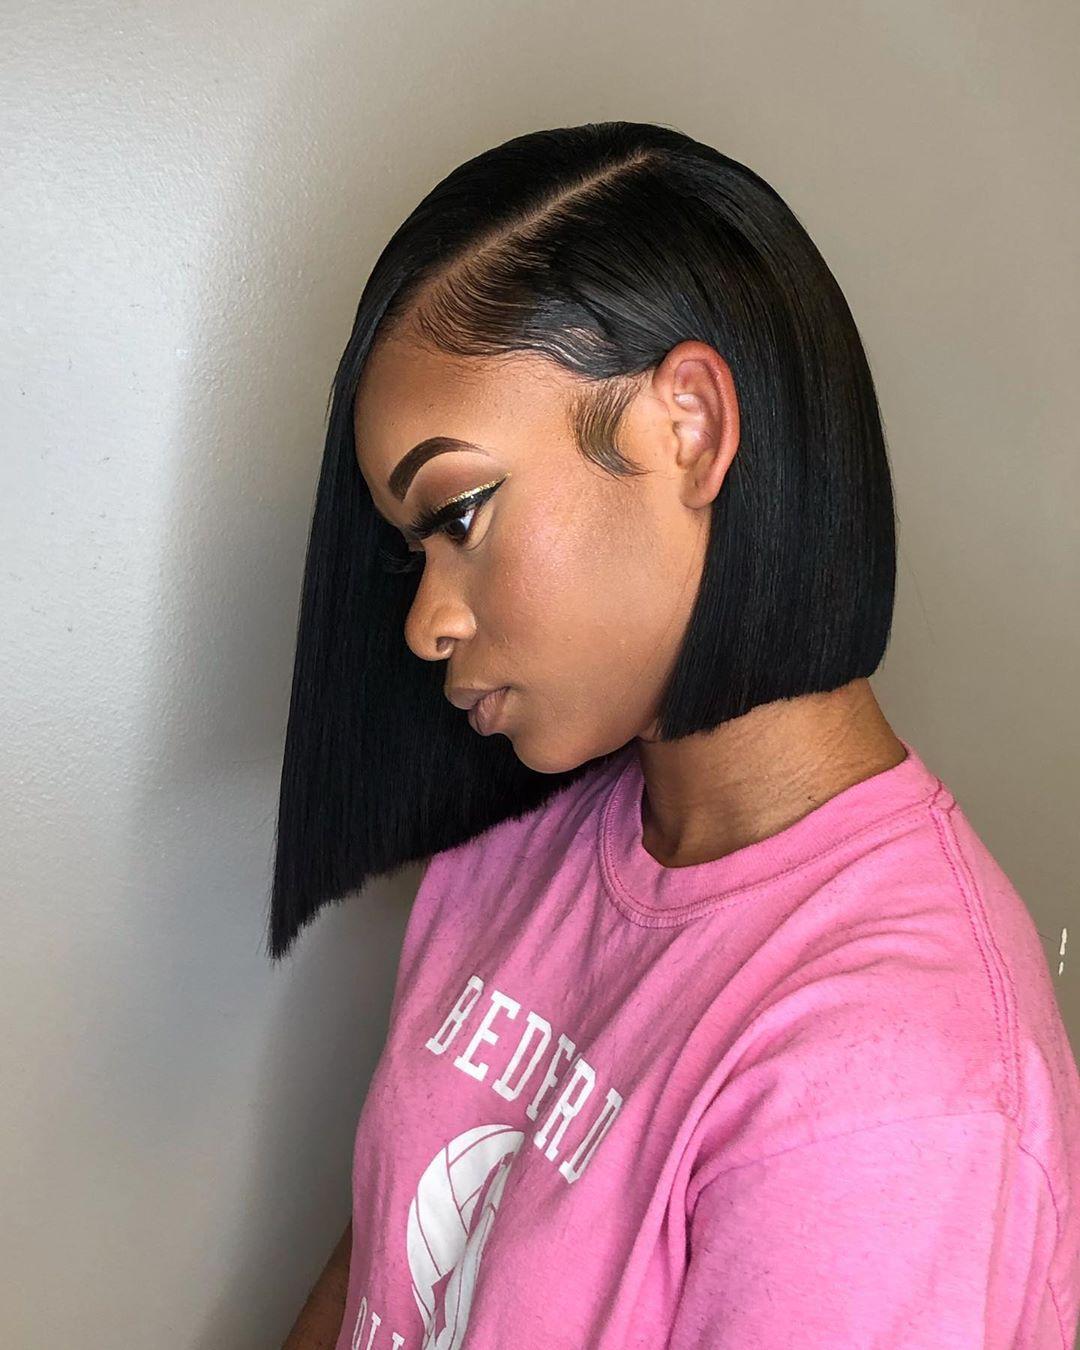 Blunt Cut Bob Weave : blunt, weave, Blunt, Asymmetrical, ✨🎀📐, #HBMJ, #mjontheslay, Bluntcutbob, #asymmet…, Black, Women, Weave, Hairstyles,, Hairstyles